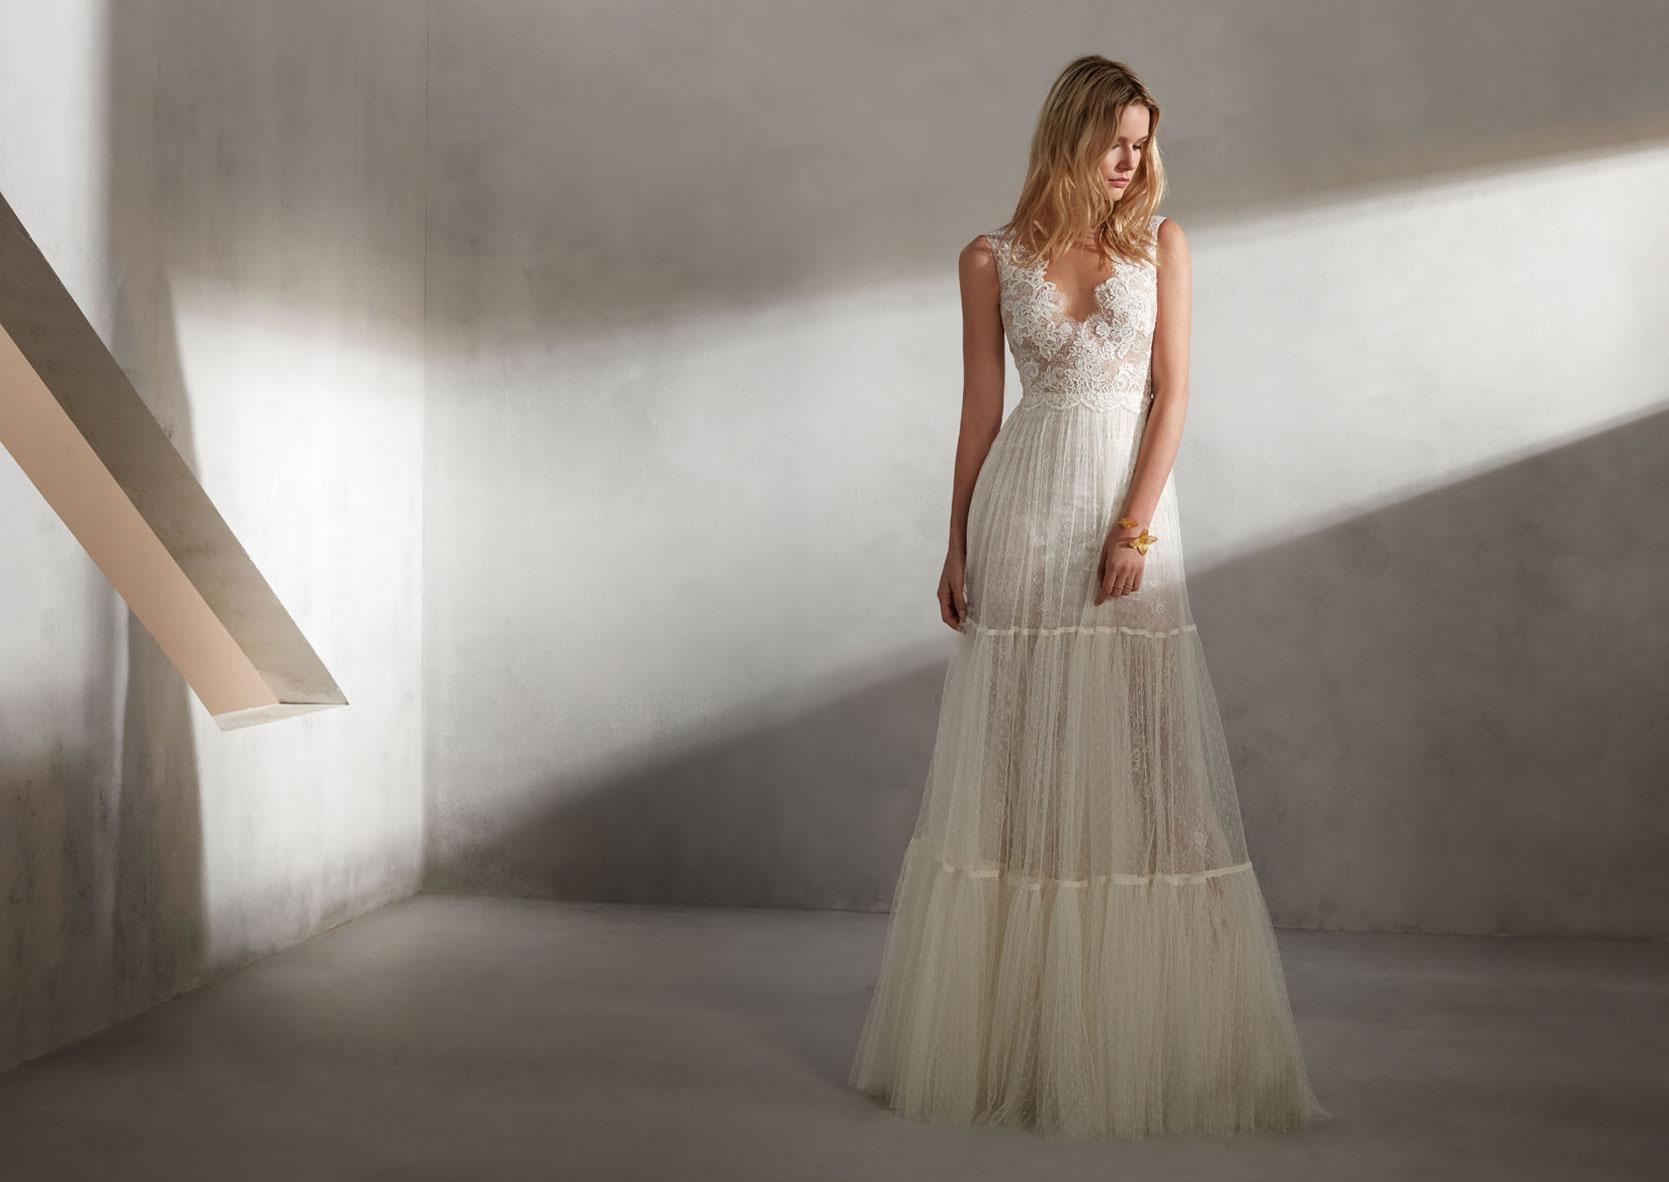 Brautkleid_A_Linie_Spitze-Hochzeitskleid_Glitzer